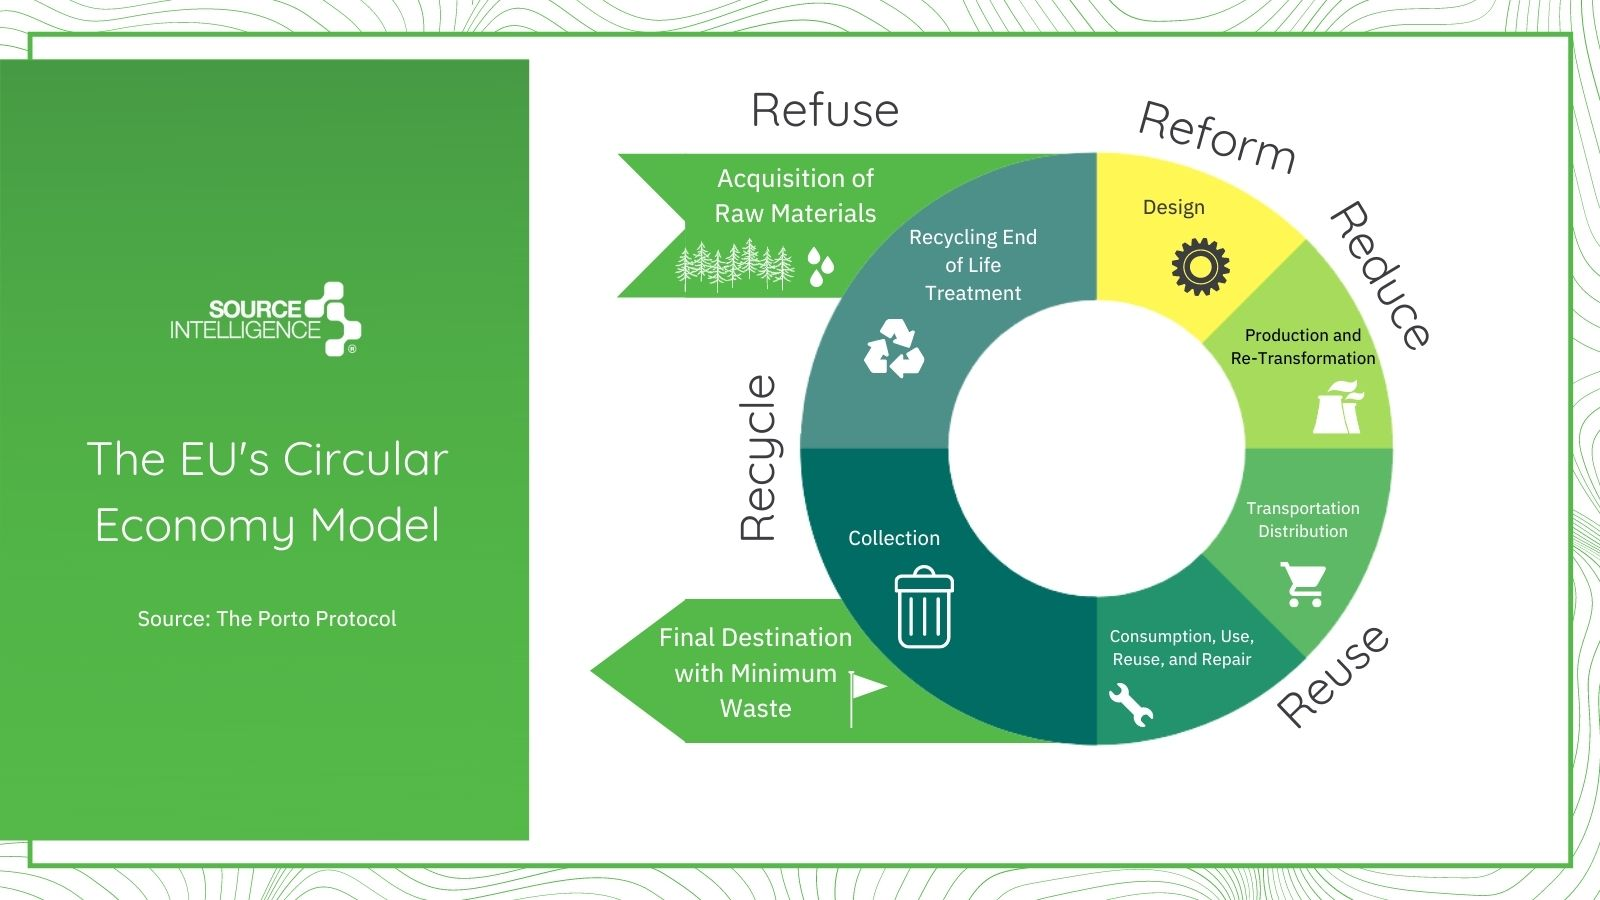 SCIP Database FAQ Circular Economy diagram